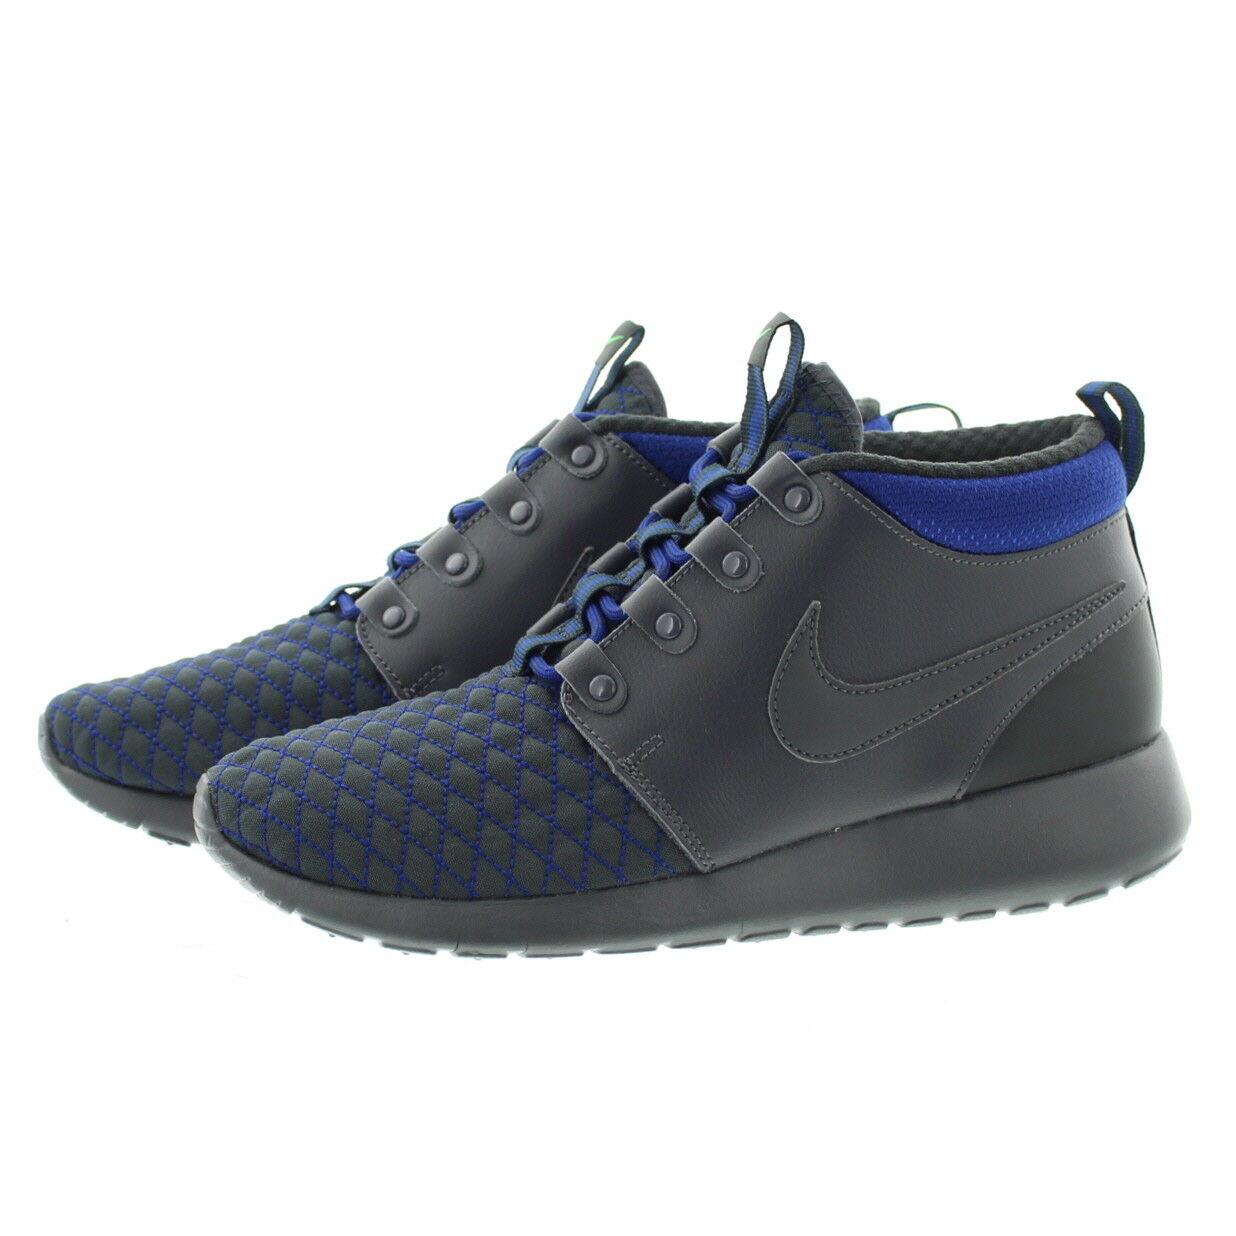 Nike 807575-001 Kids Youth Boys Girls